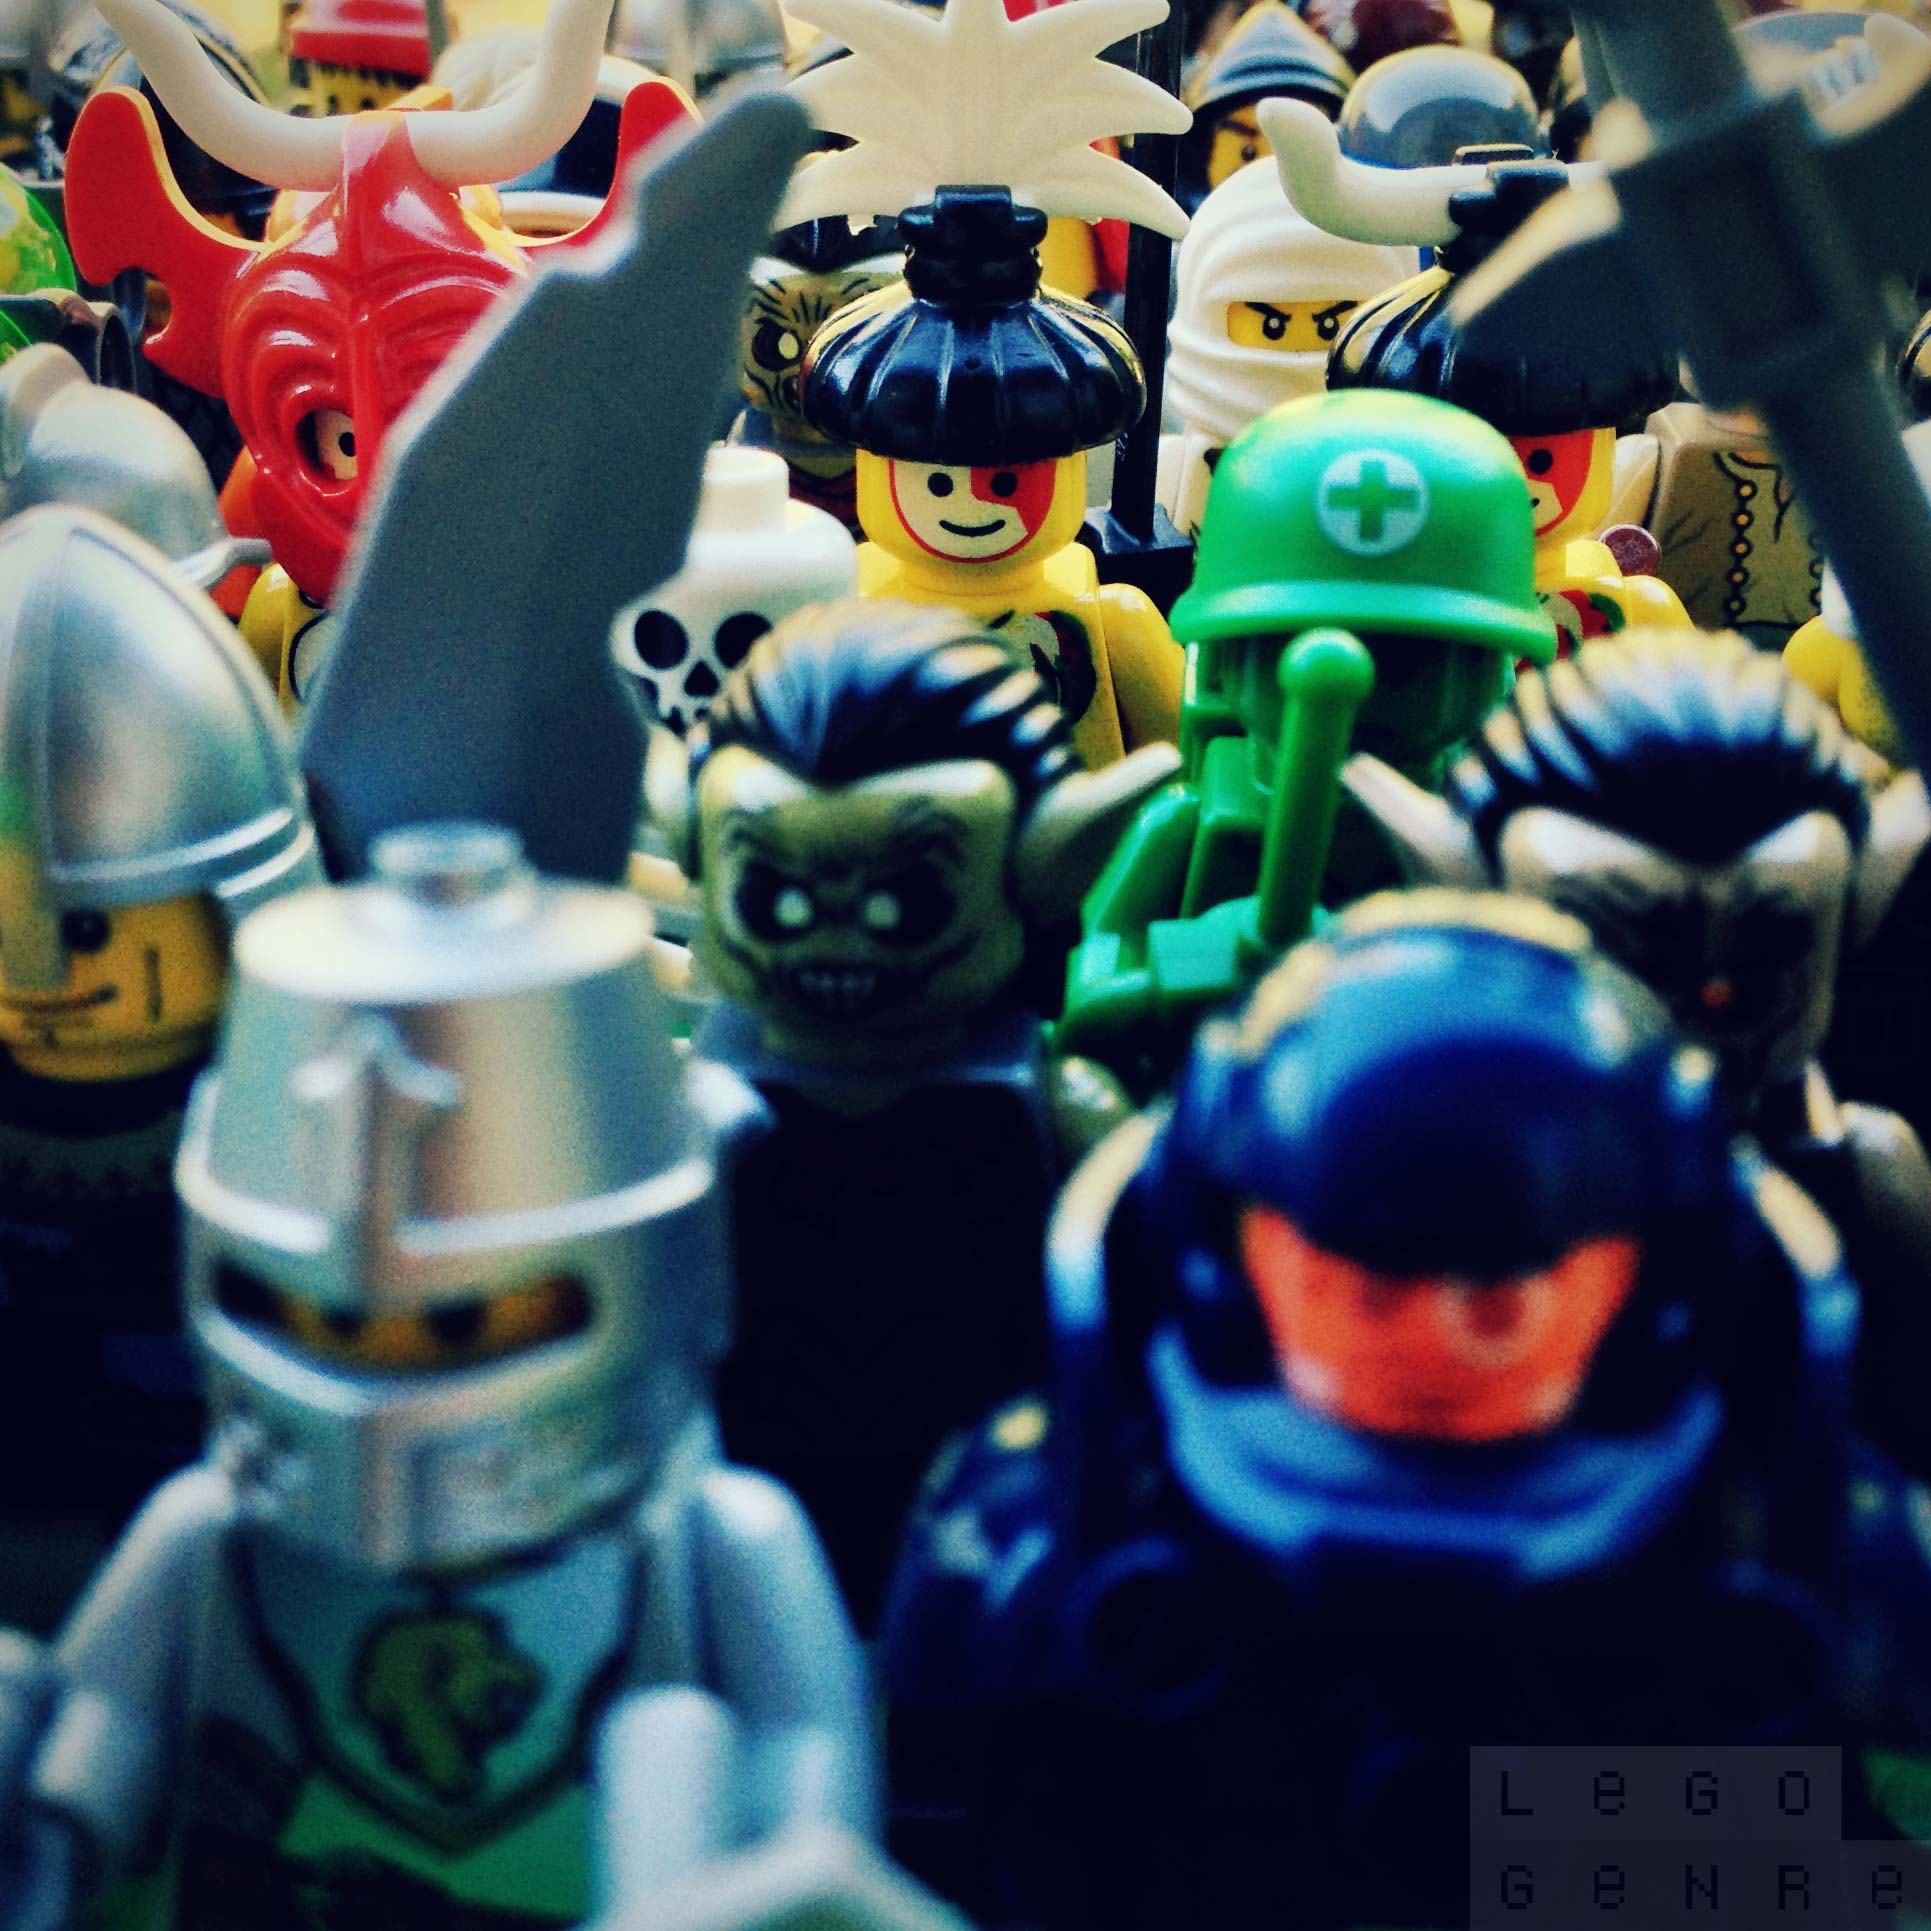 LegoGenre 00300: Minifigs!